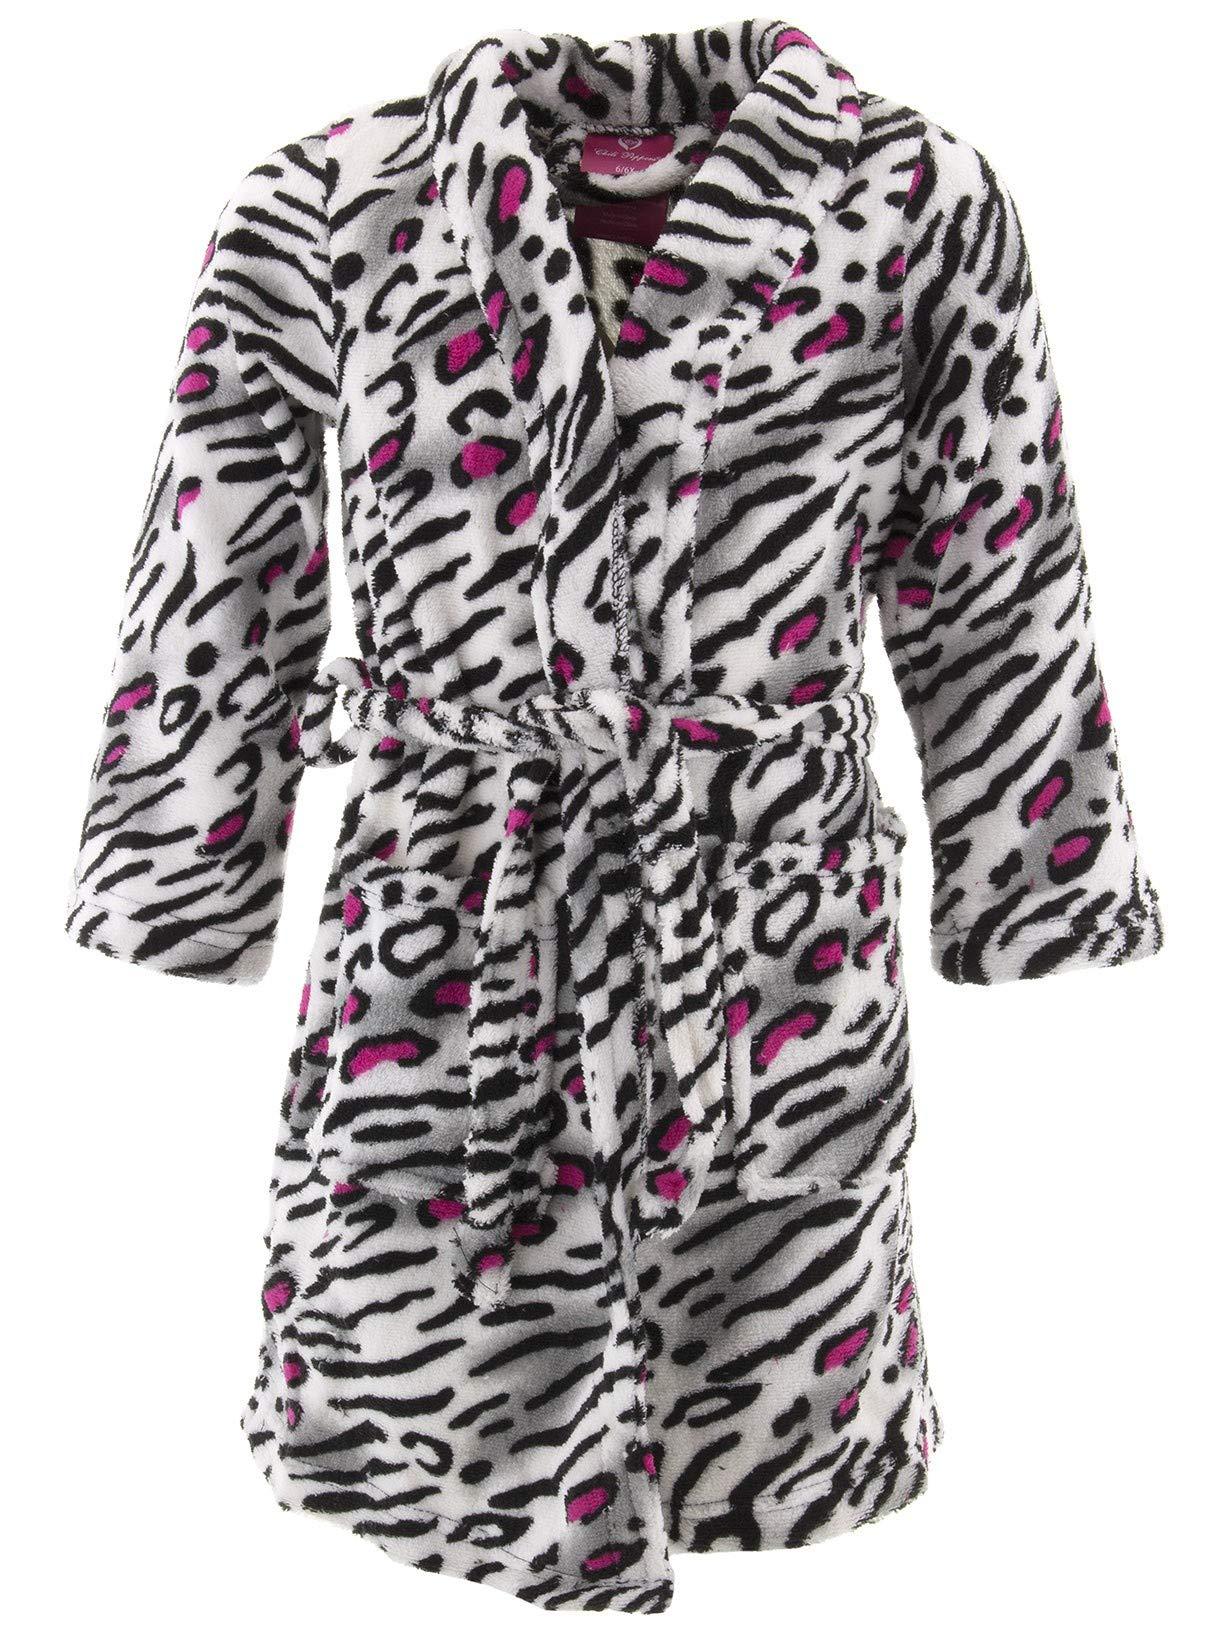 Chili Peppers Big Girls' White Pink Leopard Fleece Bathrobe 12-14